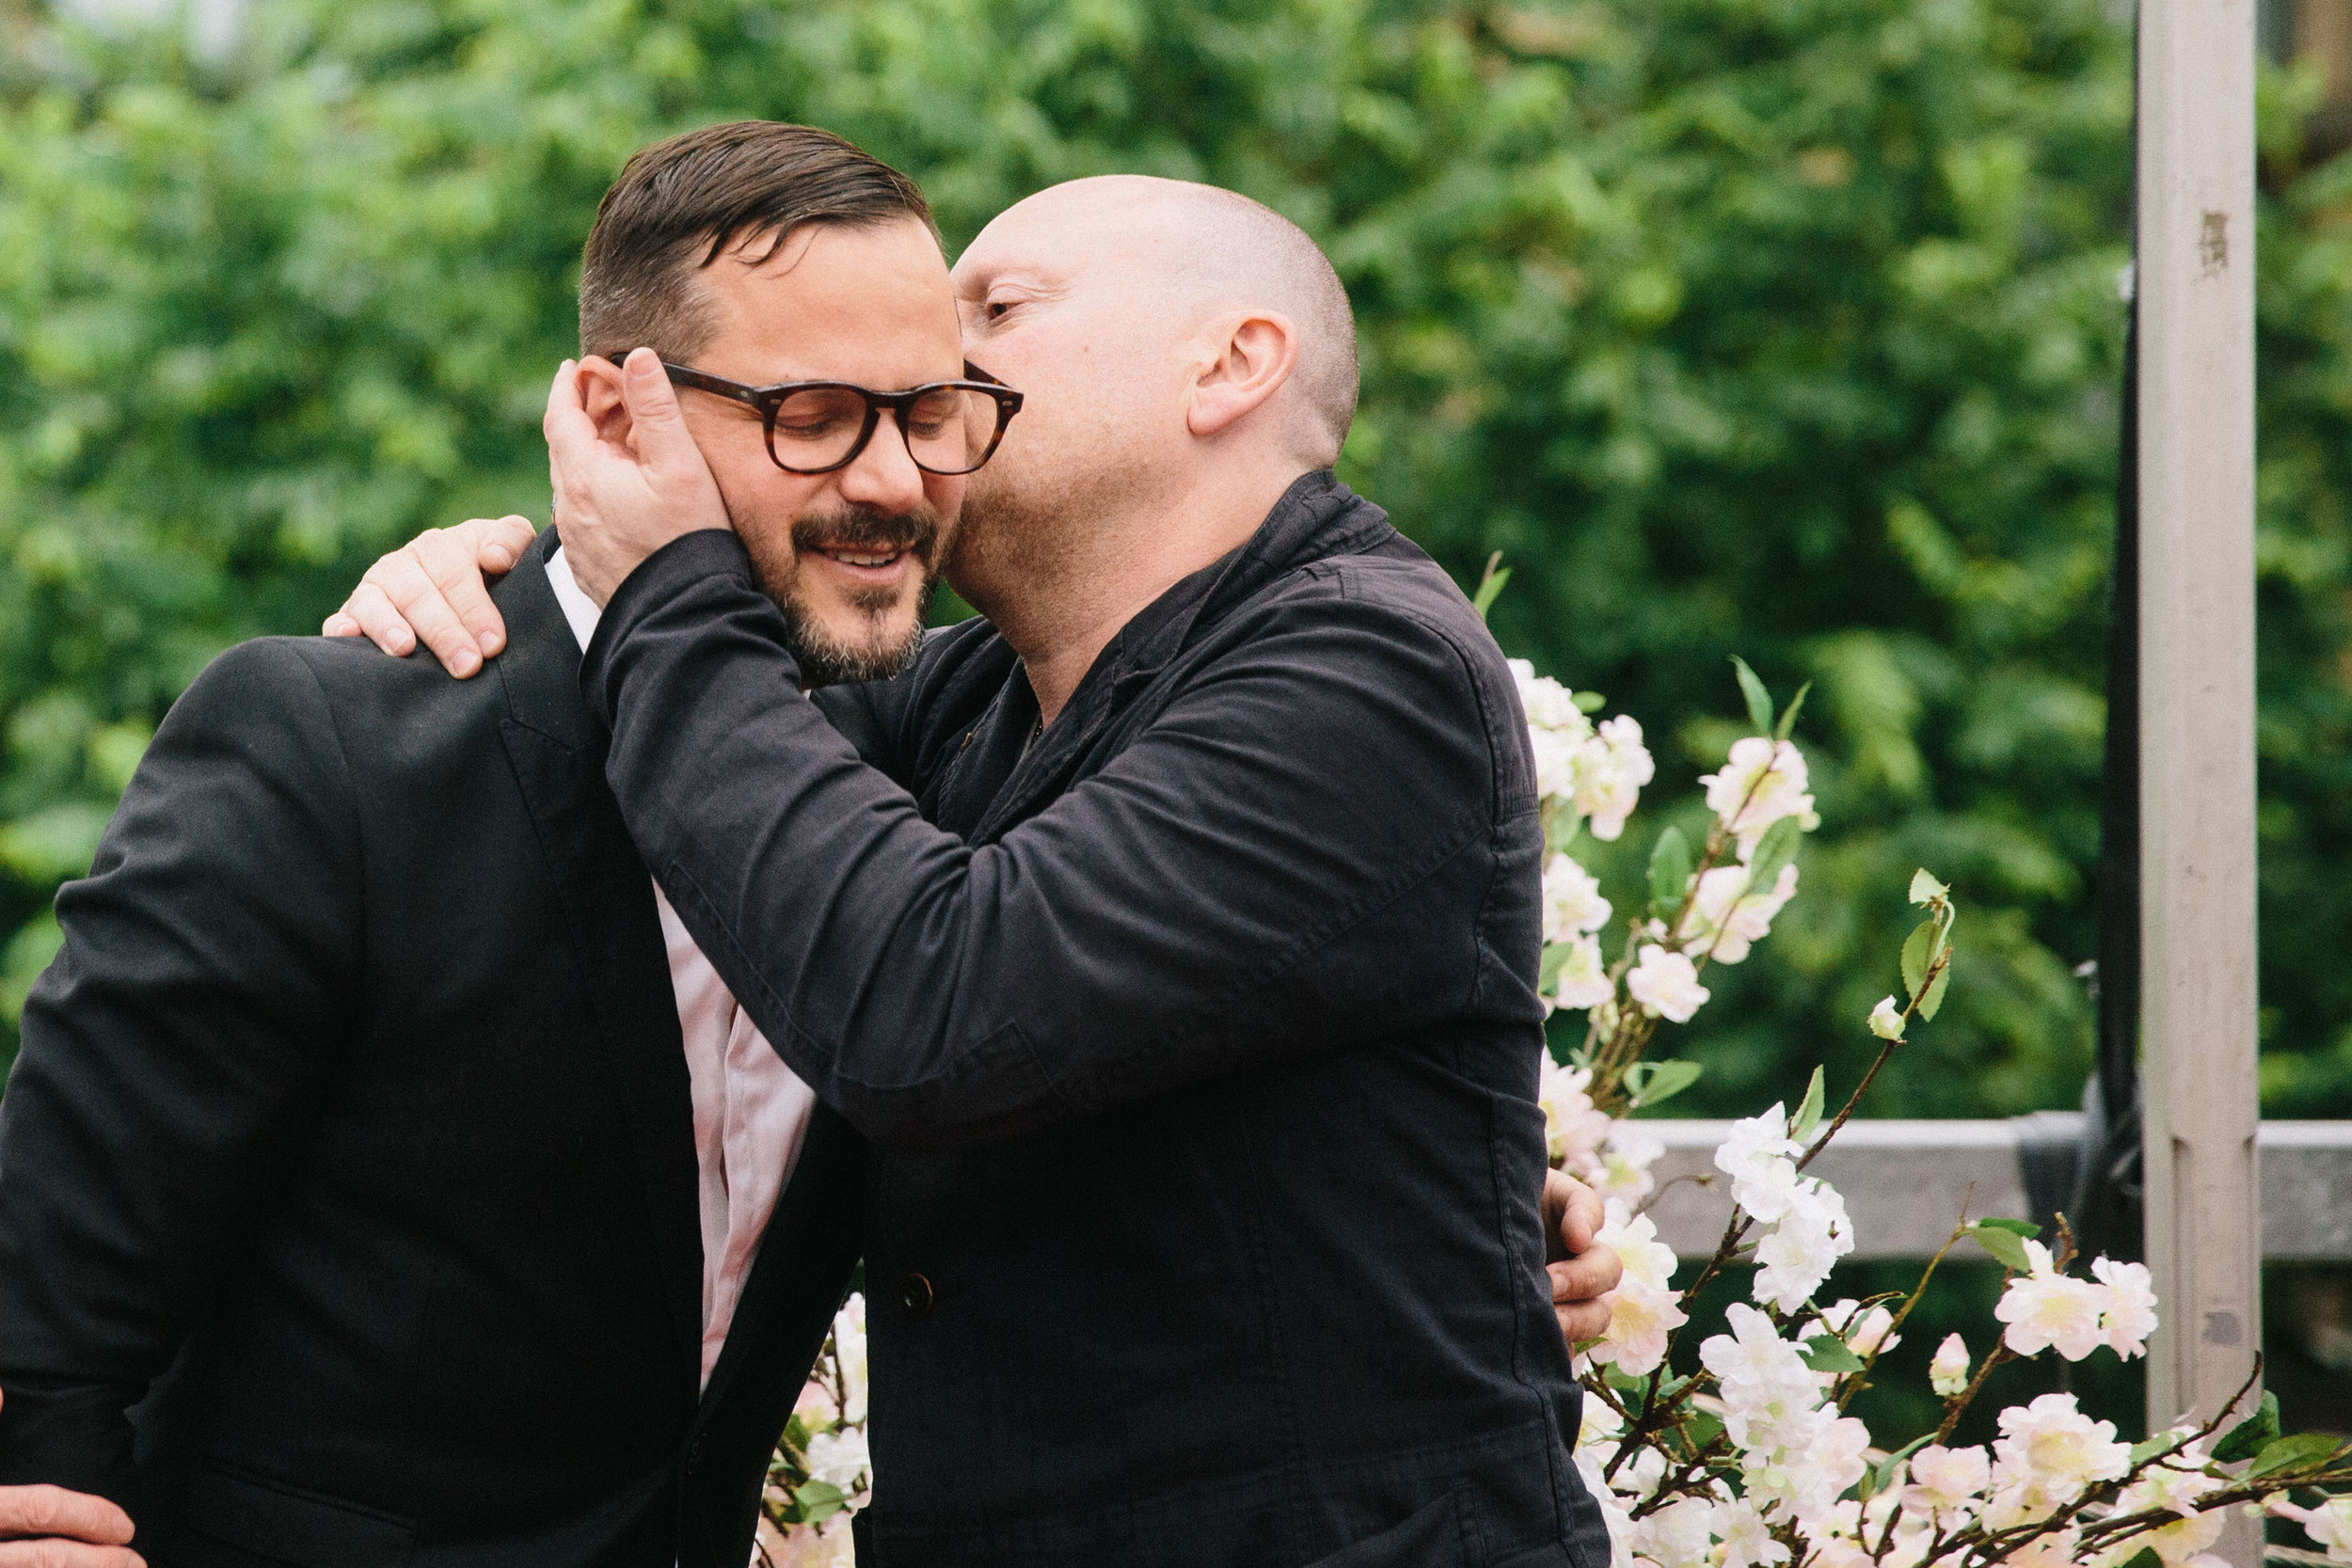 West-London-wedding-party-in-Ladbroke-Grove-Michael-Newington-Gray-51.jpg